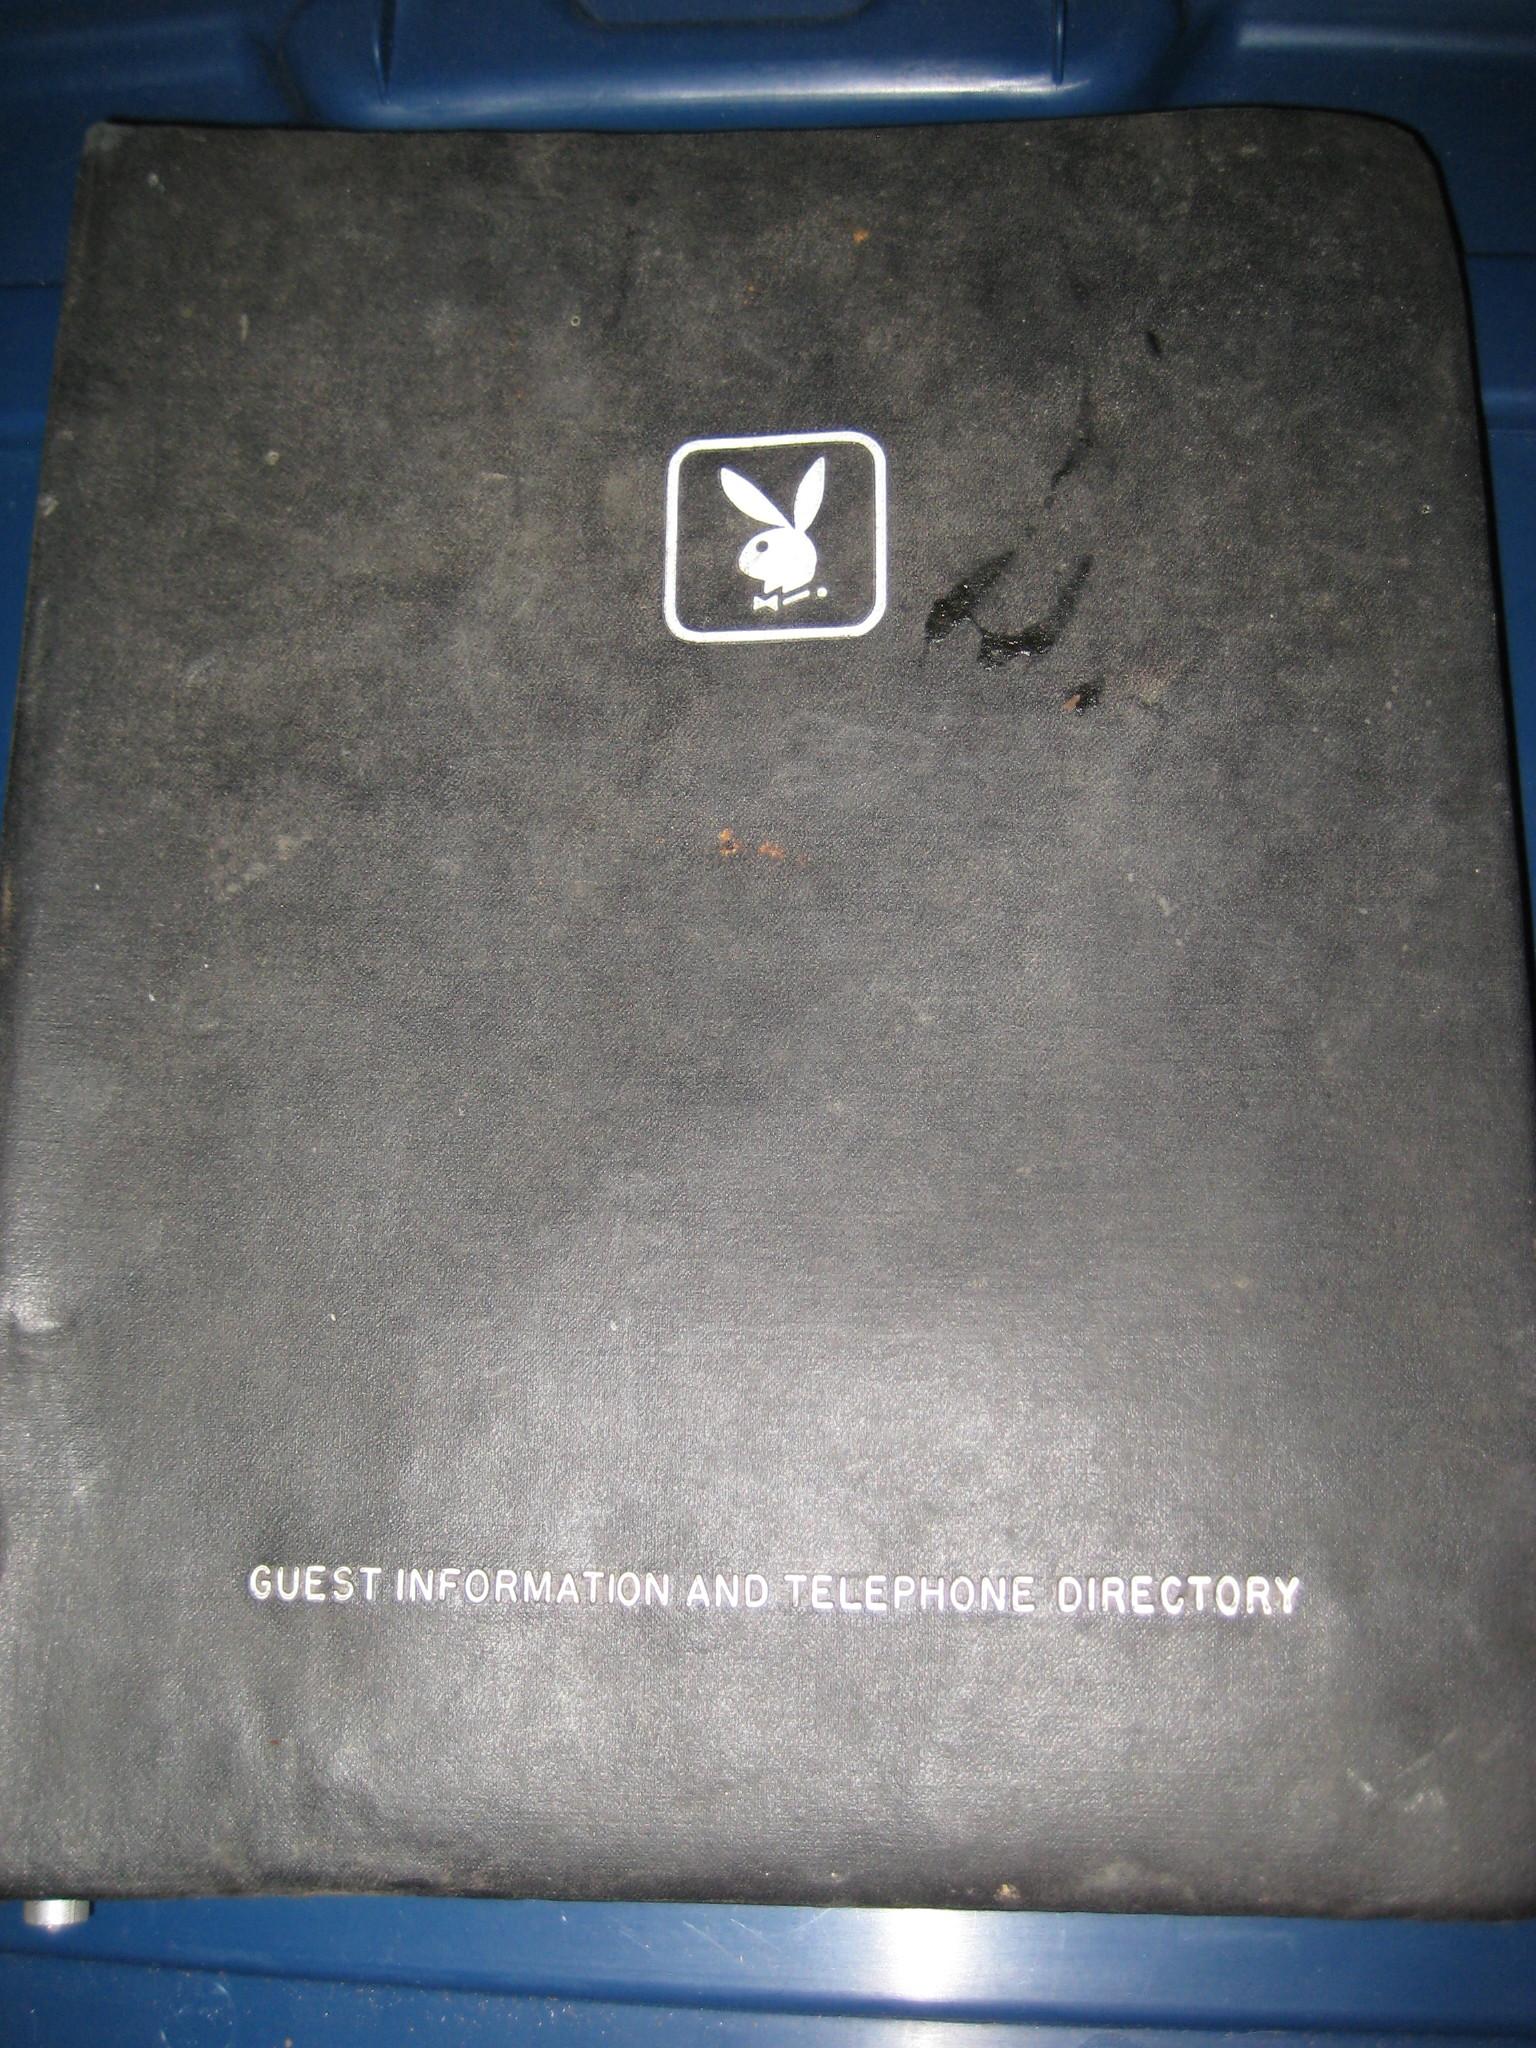 Playboy Club Lake Geneva Telephone Directory